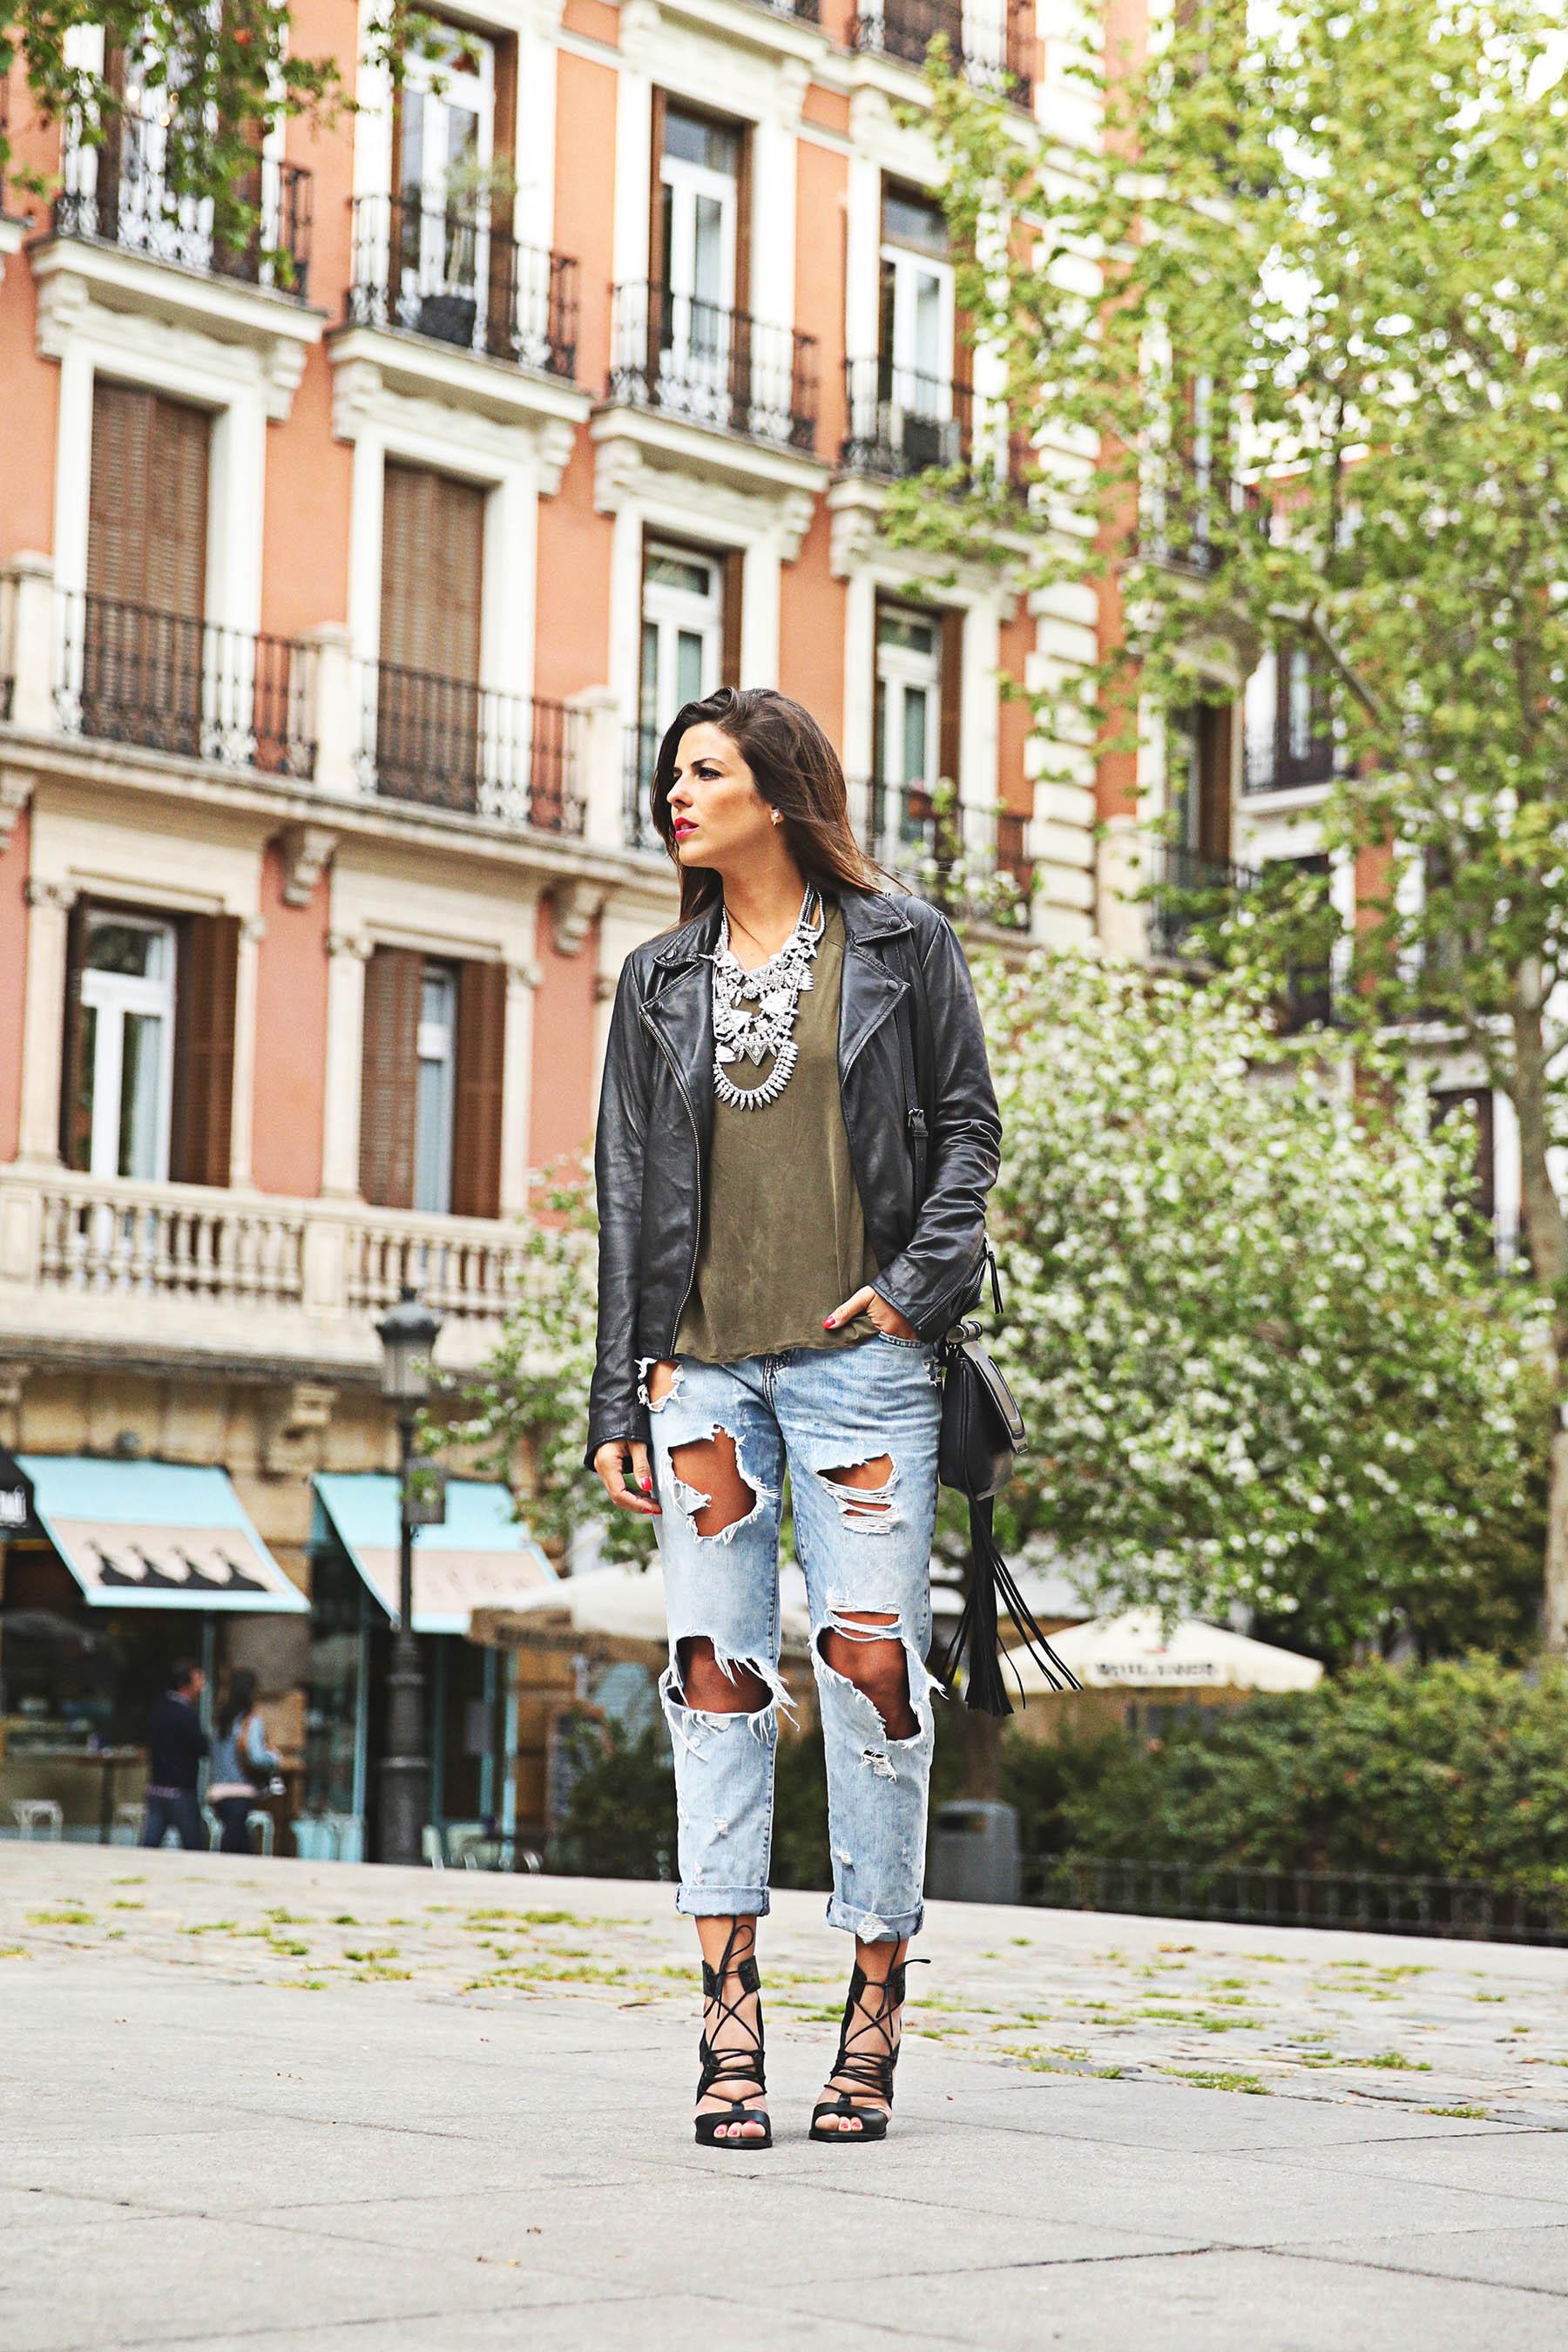 trendy-taste-look-outfit-street-style-ootd-blog-blogger-fashion-spain-moda-españa-boyfriend-vaqueros-jeans-steve-madden-sandalias-verano-primavera-leather-jacket-chaqueta-cuero-khaki-caqui-ripped-rotos-4